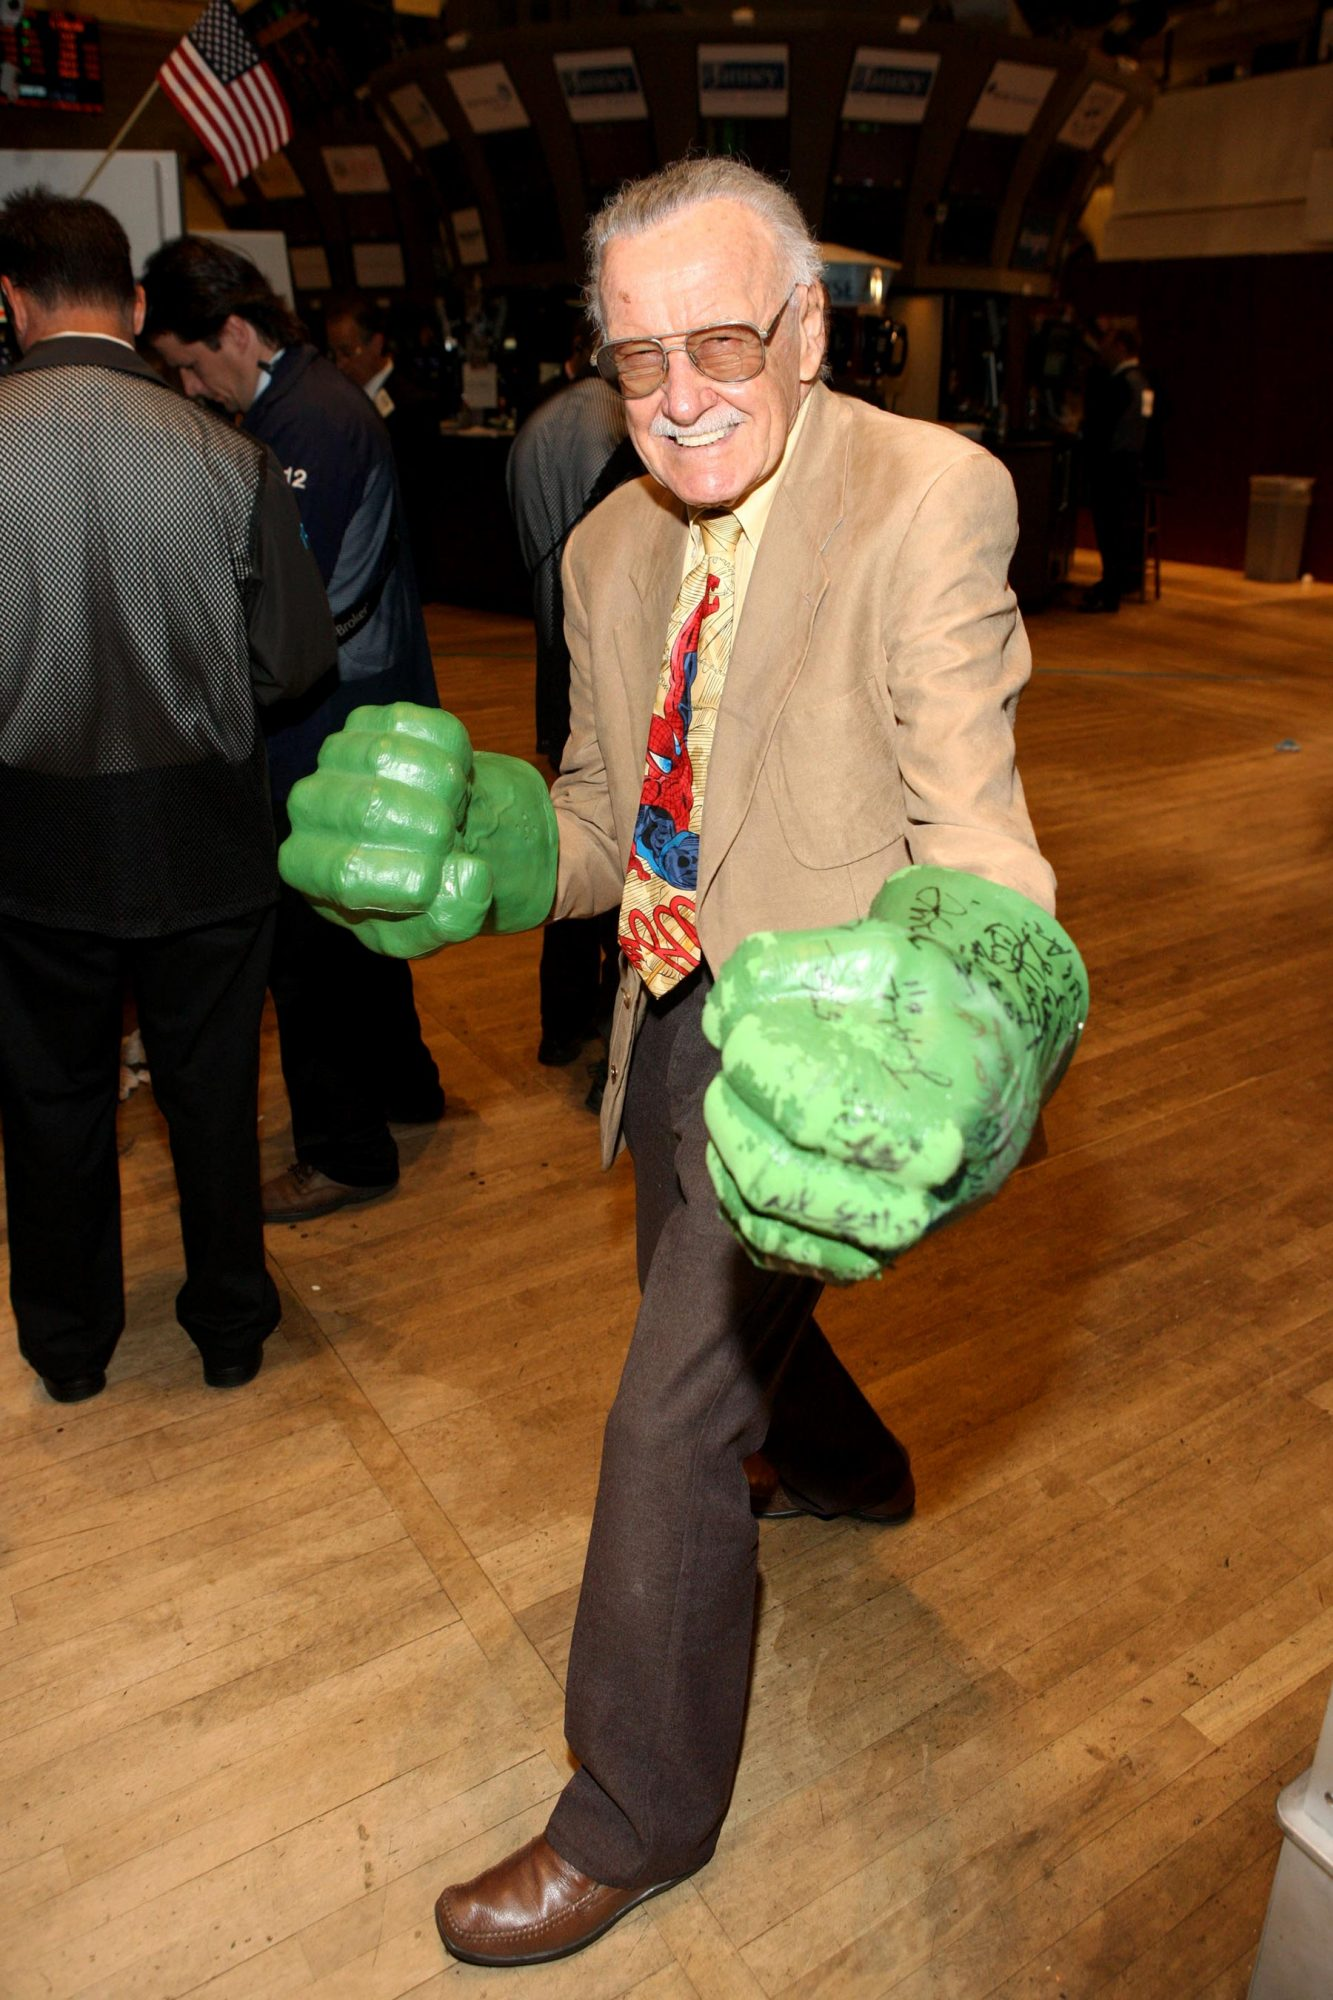 Stan Lee Visits The New York Stock Exchange - October 5, 2010